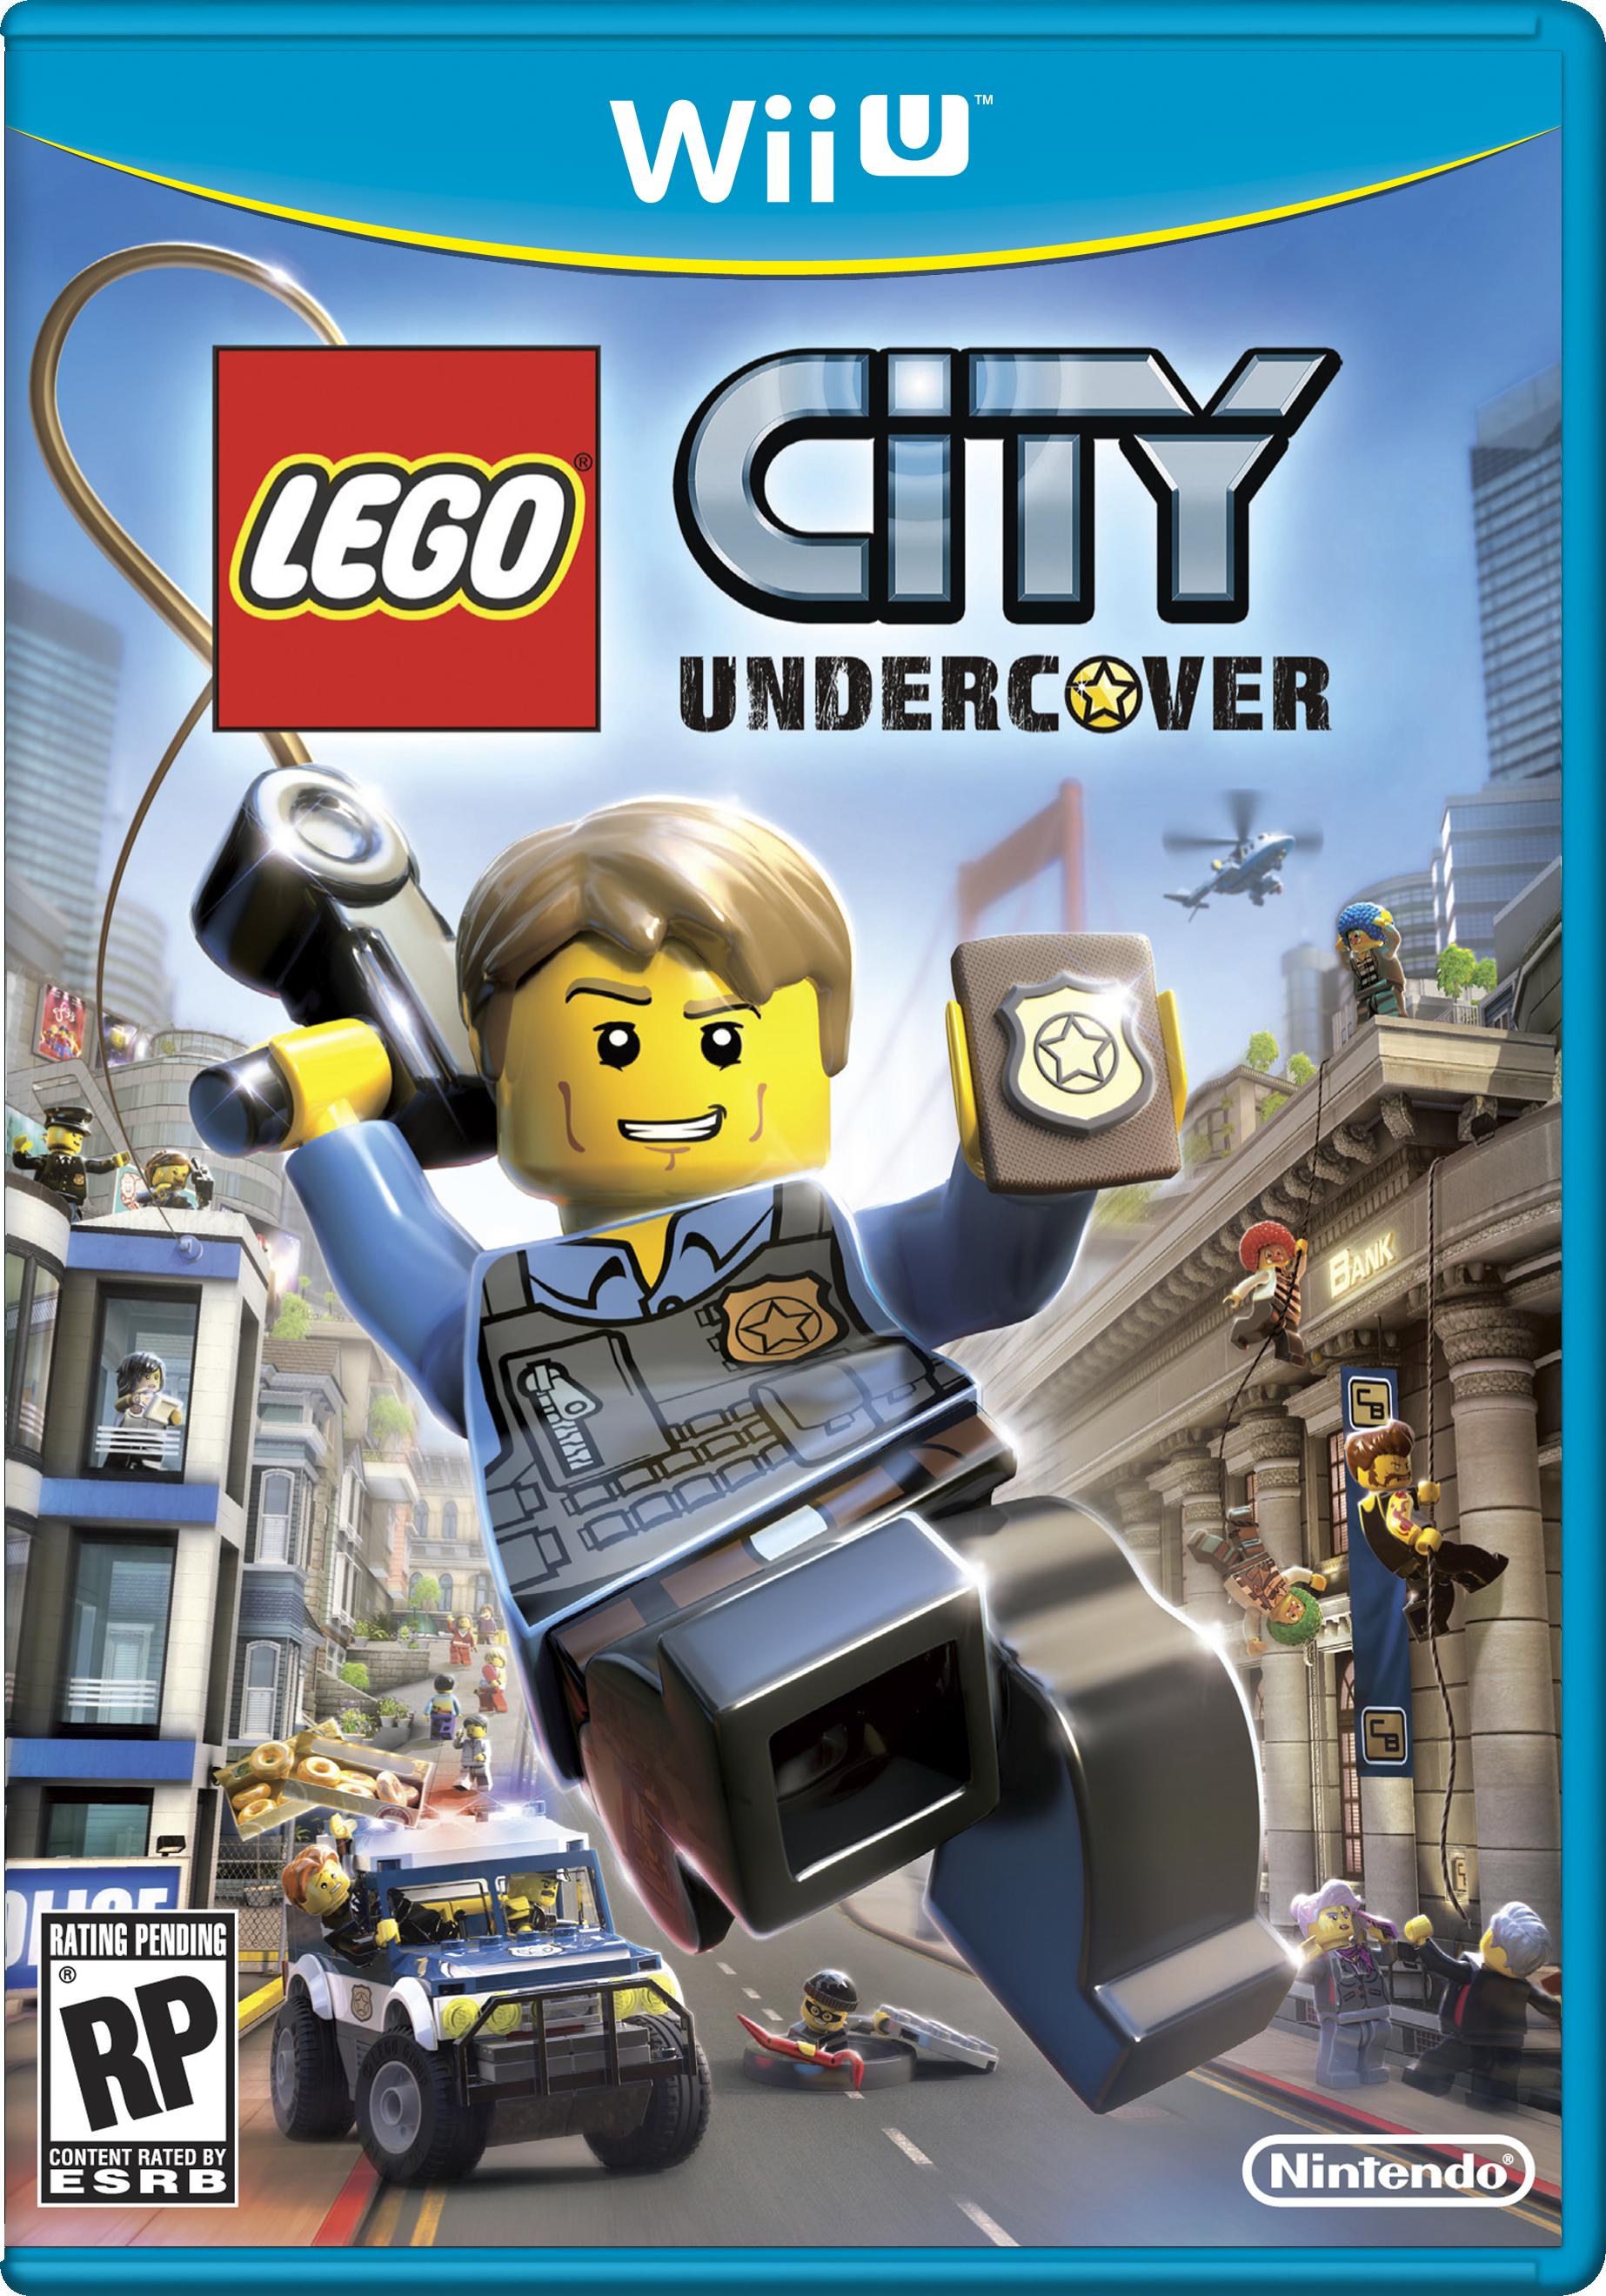 LEGOCity-Undercover Wii U Jaquette 001